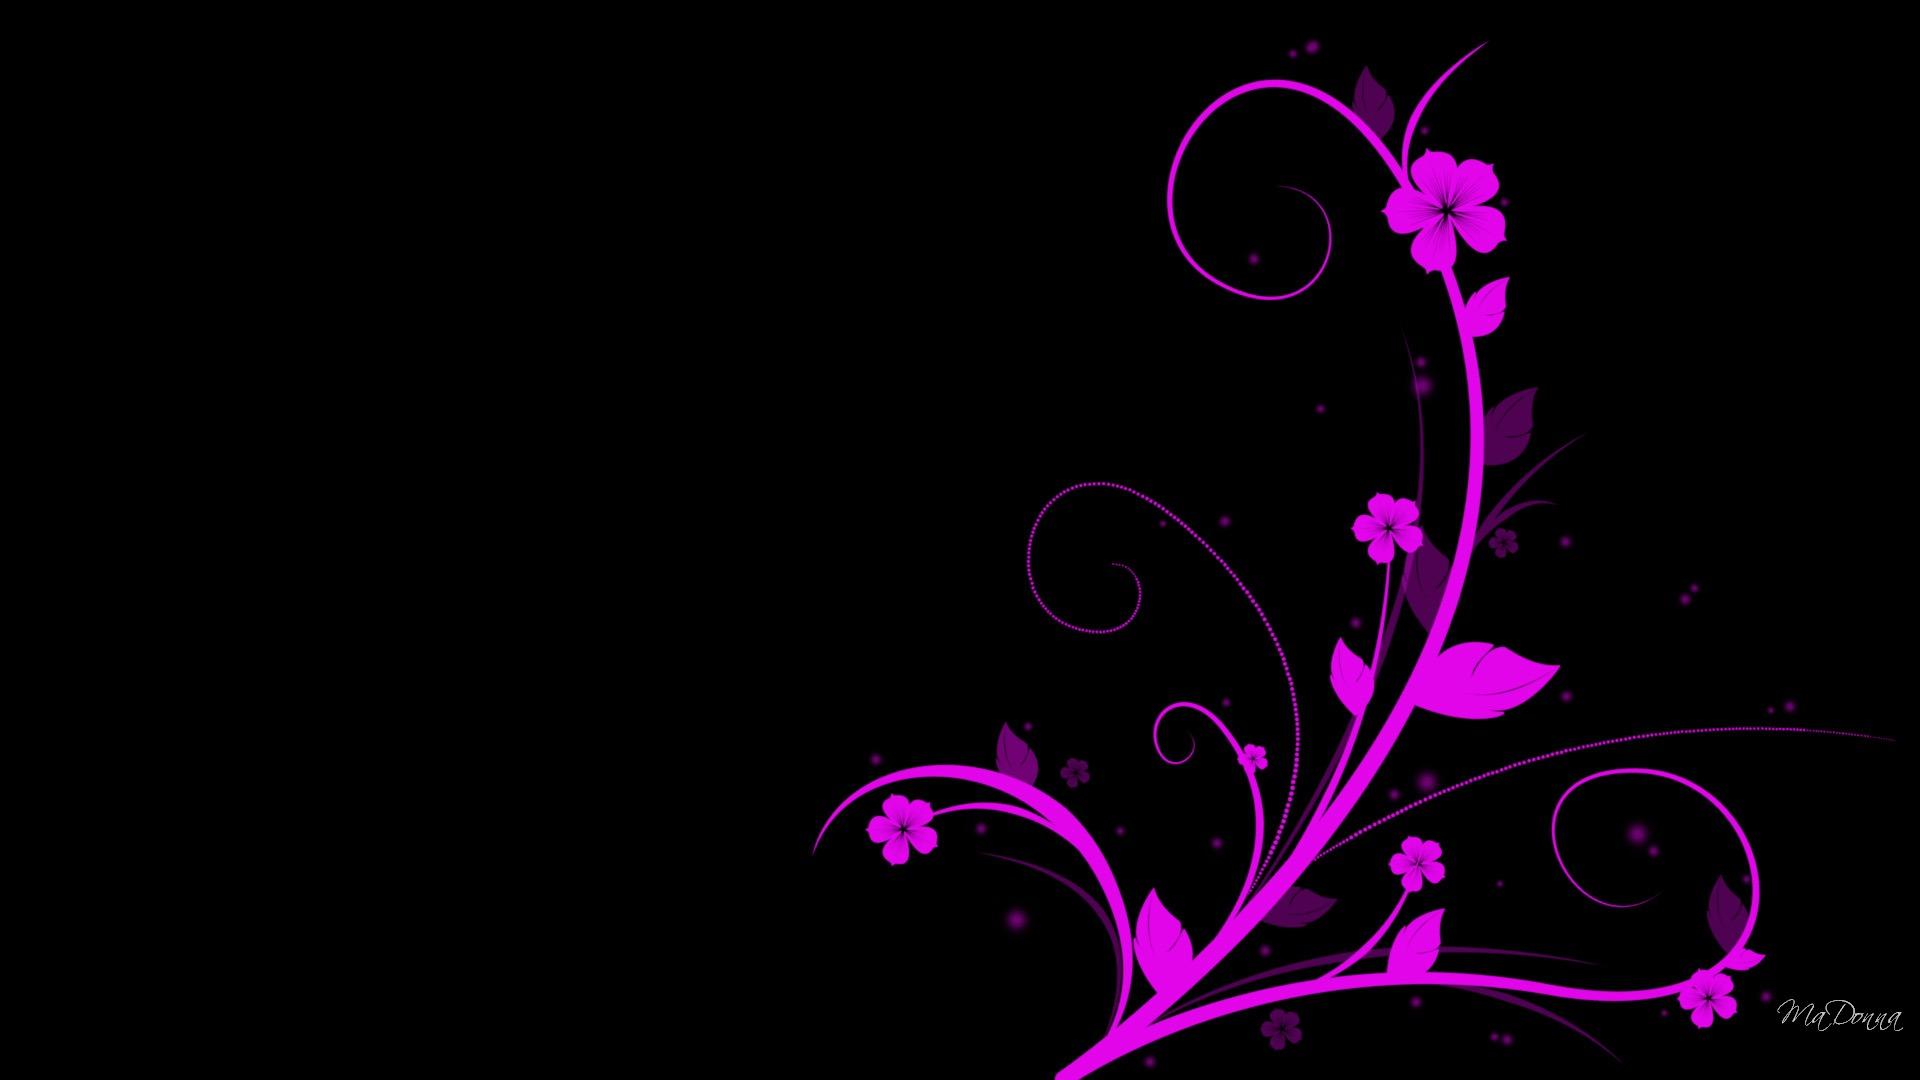 Free Download Rose Vif Sur Fond Noir Wallpaper